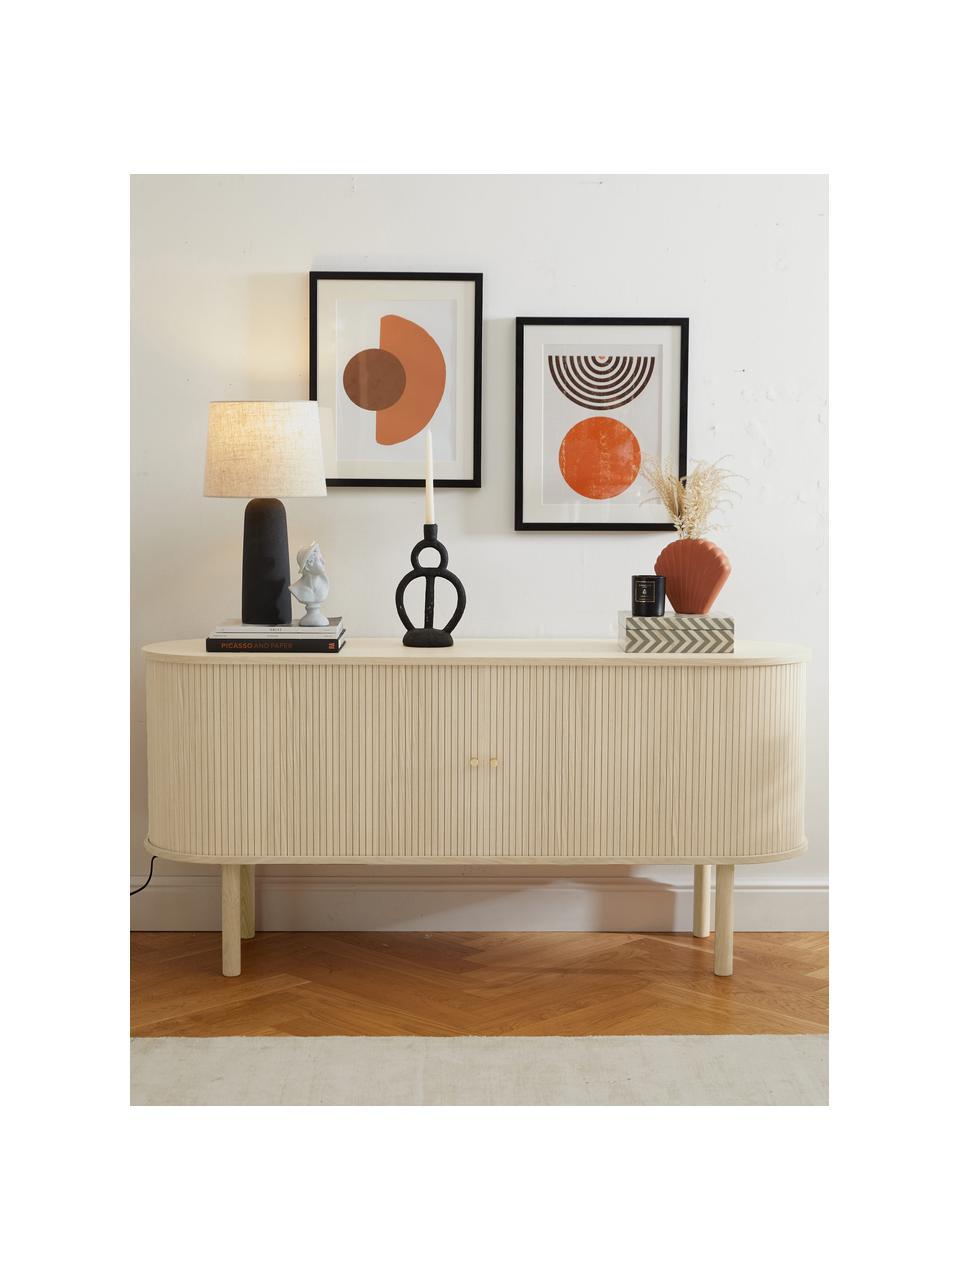 Houten dressoir Calary met lamellendeuren, Frame: MDF en multiplex met eike, Poten: massief eikenhout, Licht hout, 160 x 75 cm